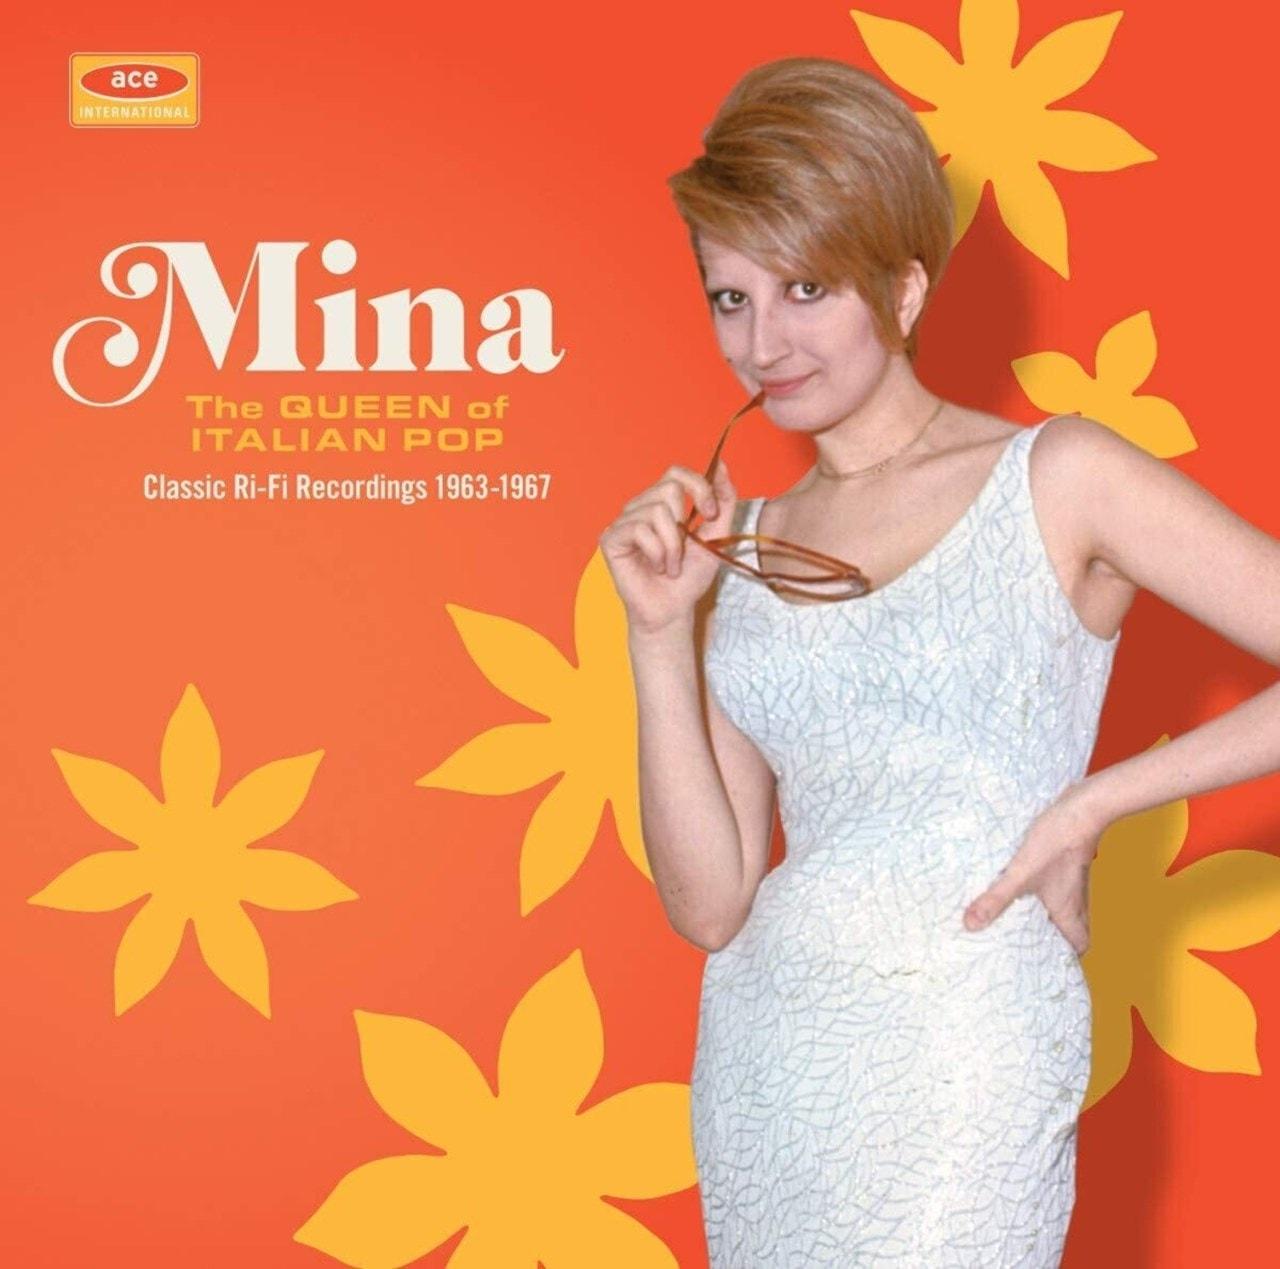 The Queen of Italian Pop: Classic Ri-fi Recordings 1969-1967 - 1